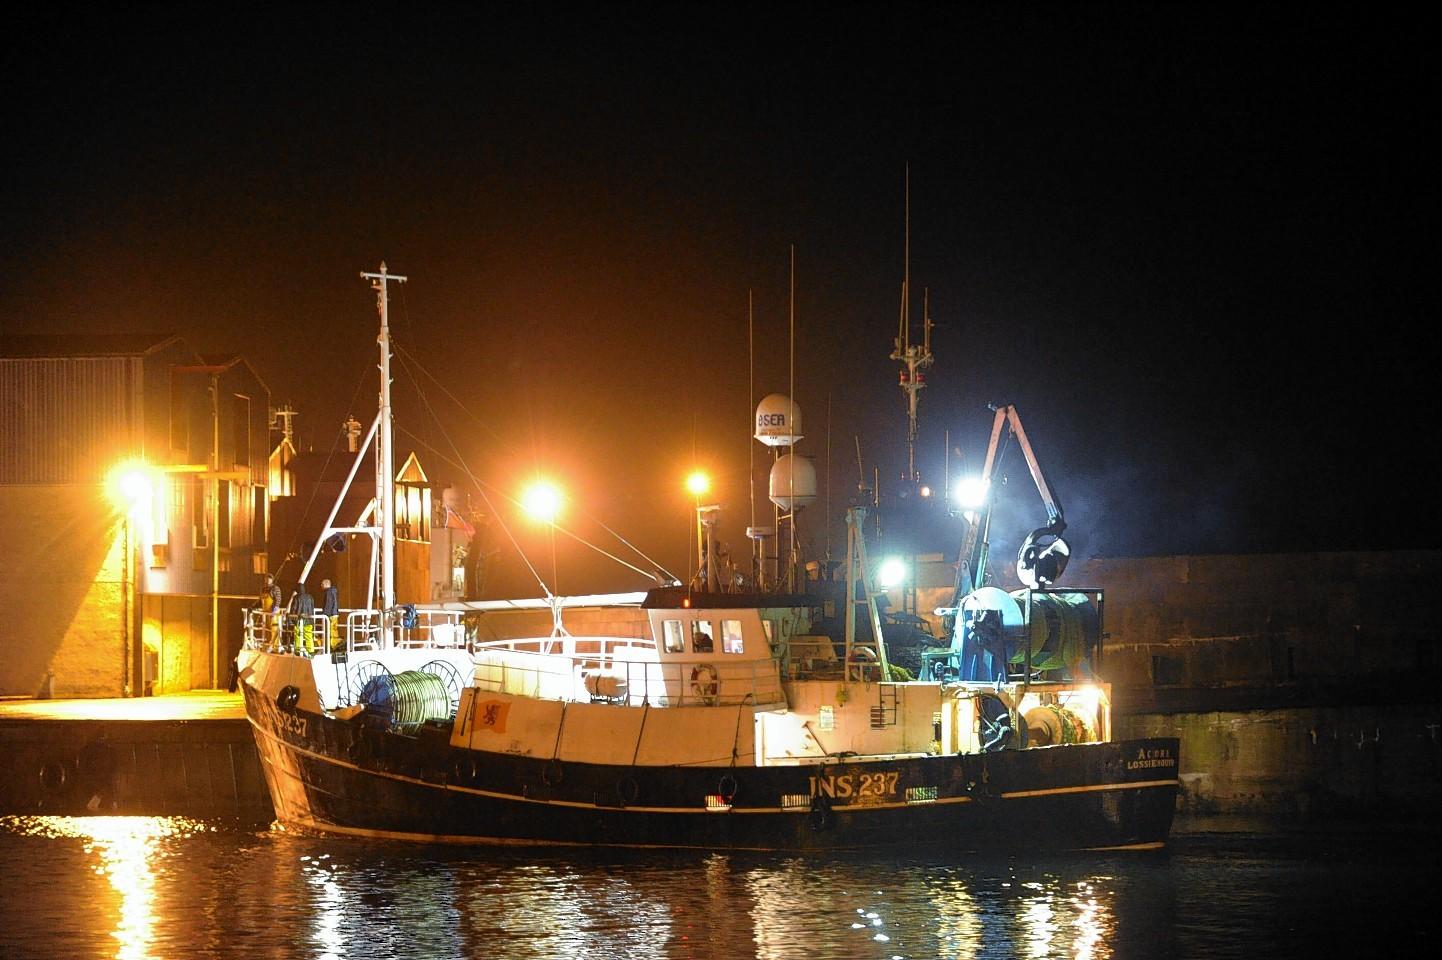 The Acorn arrived at Fraserburgh last night